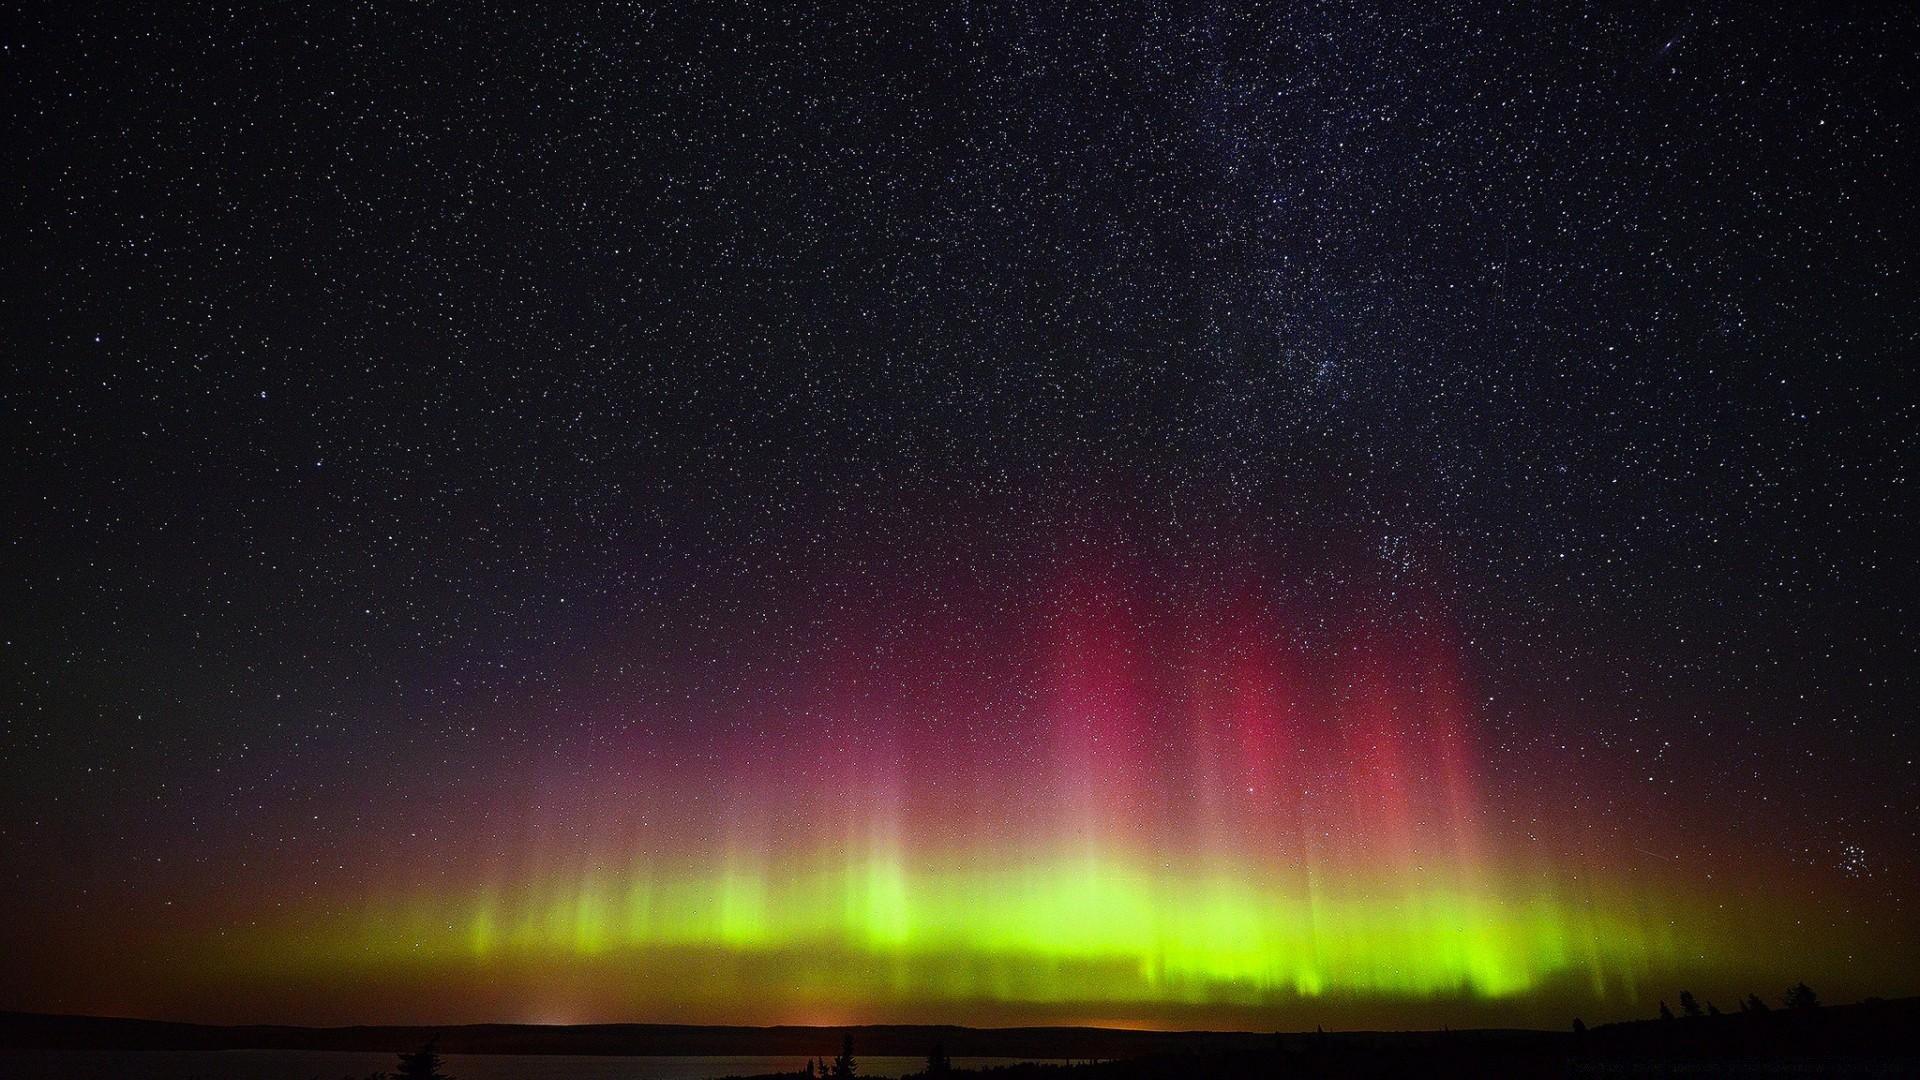 Perfection Aurora Borealis Desktop Wallpapers For Free